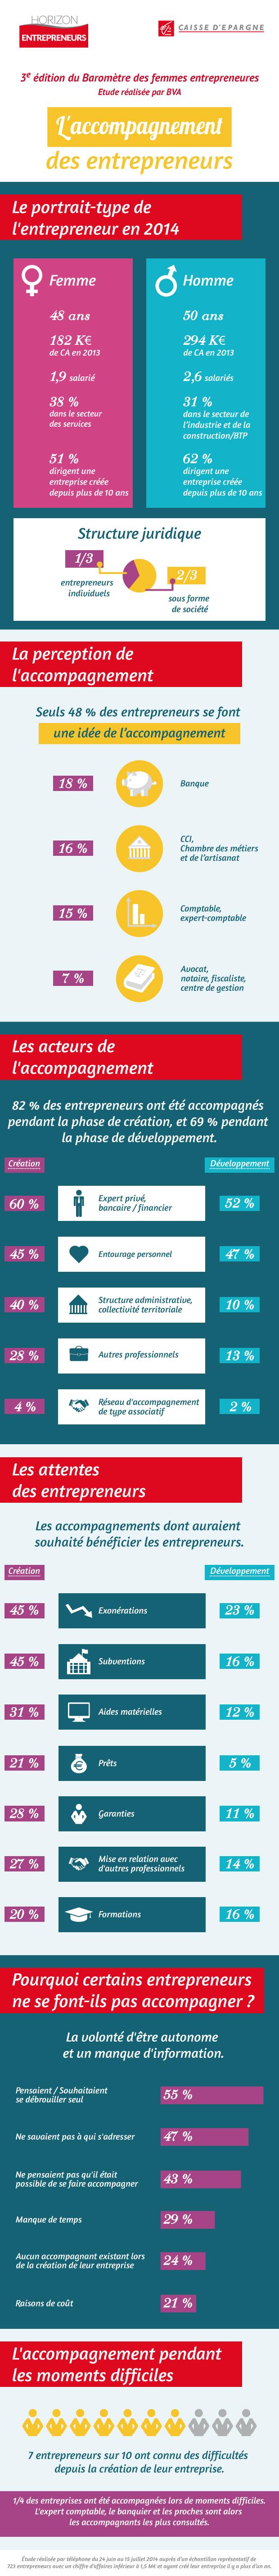 20141023_Infographie-barometre-femmes-entrepreneures-2014